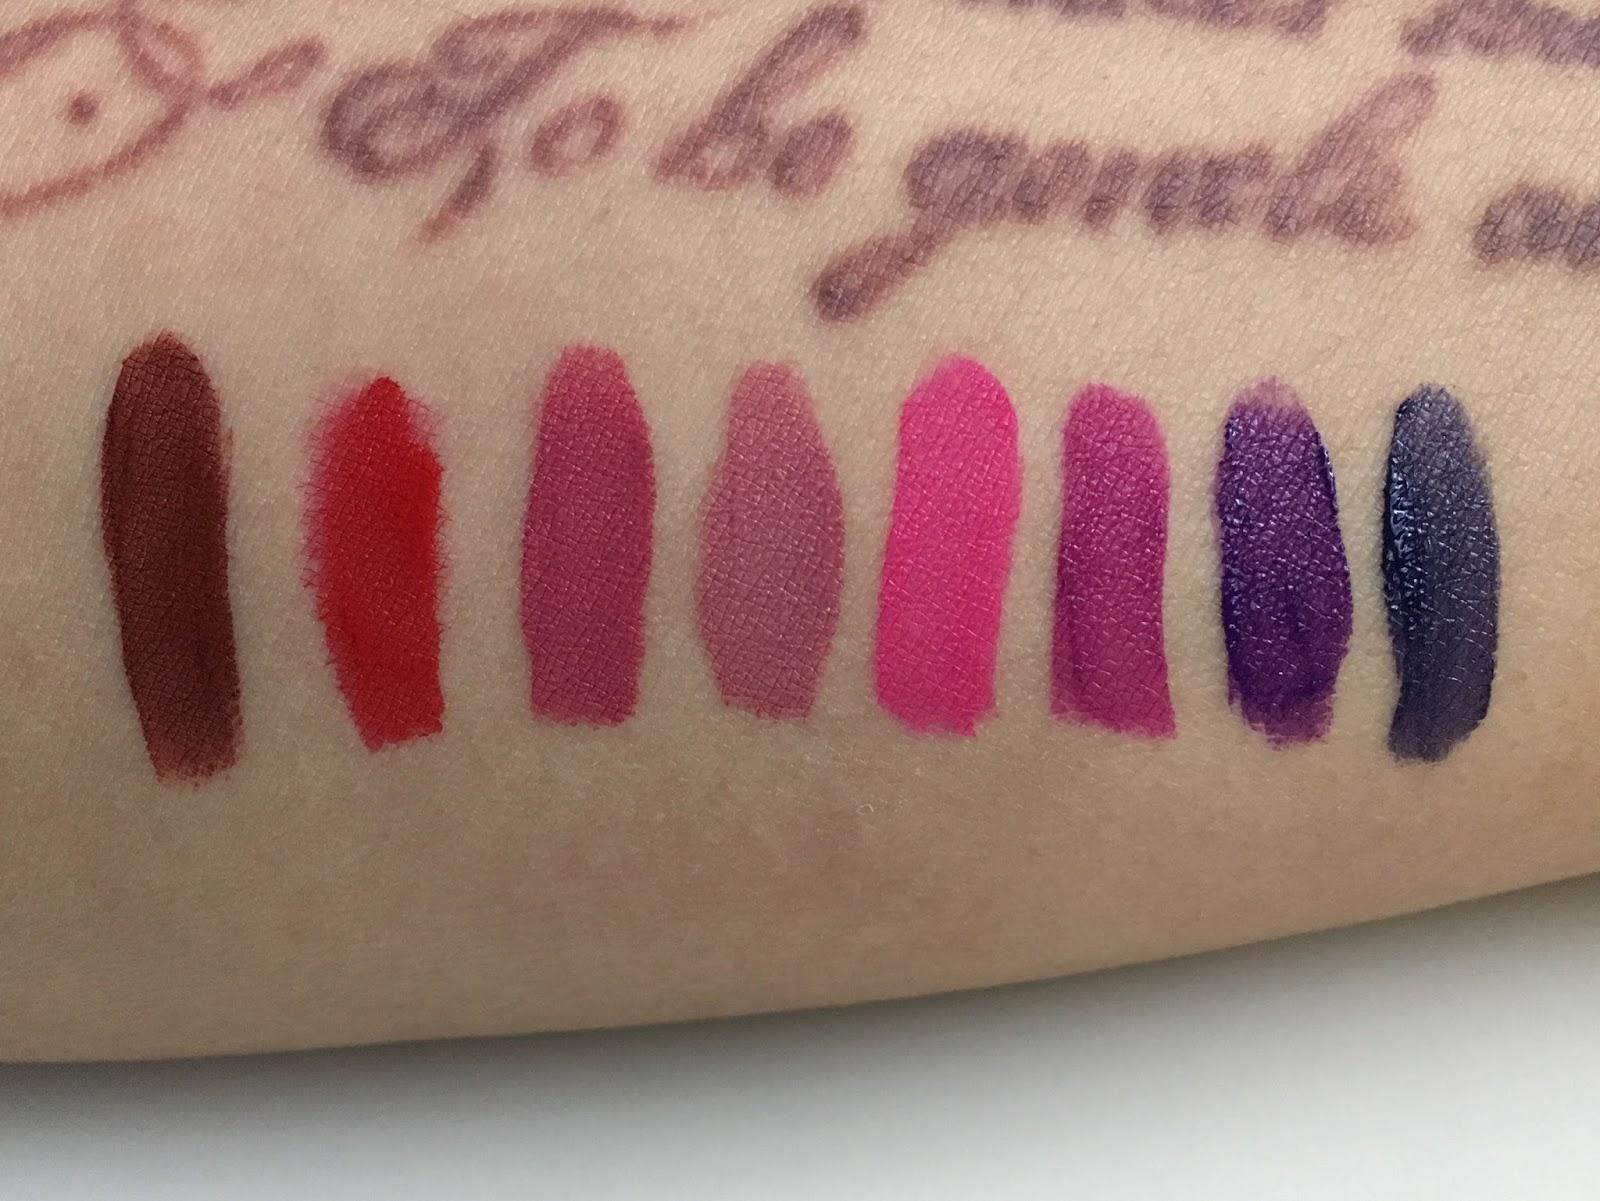 Everlasting Liquid Lipstick by KVD Vegan Beauty #14